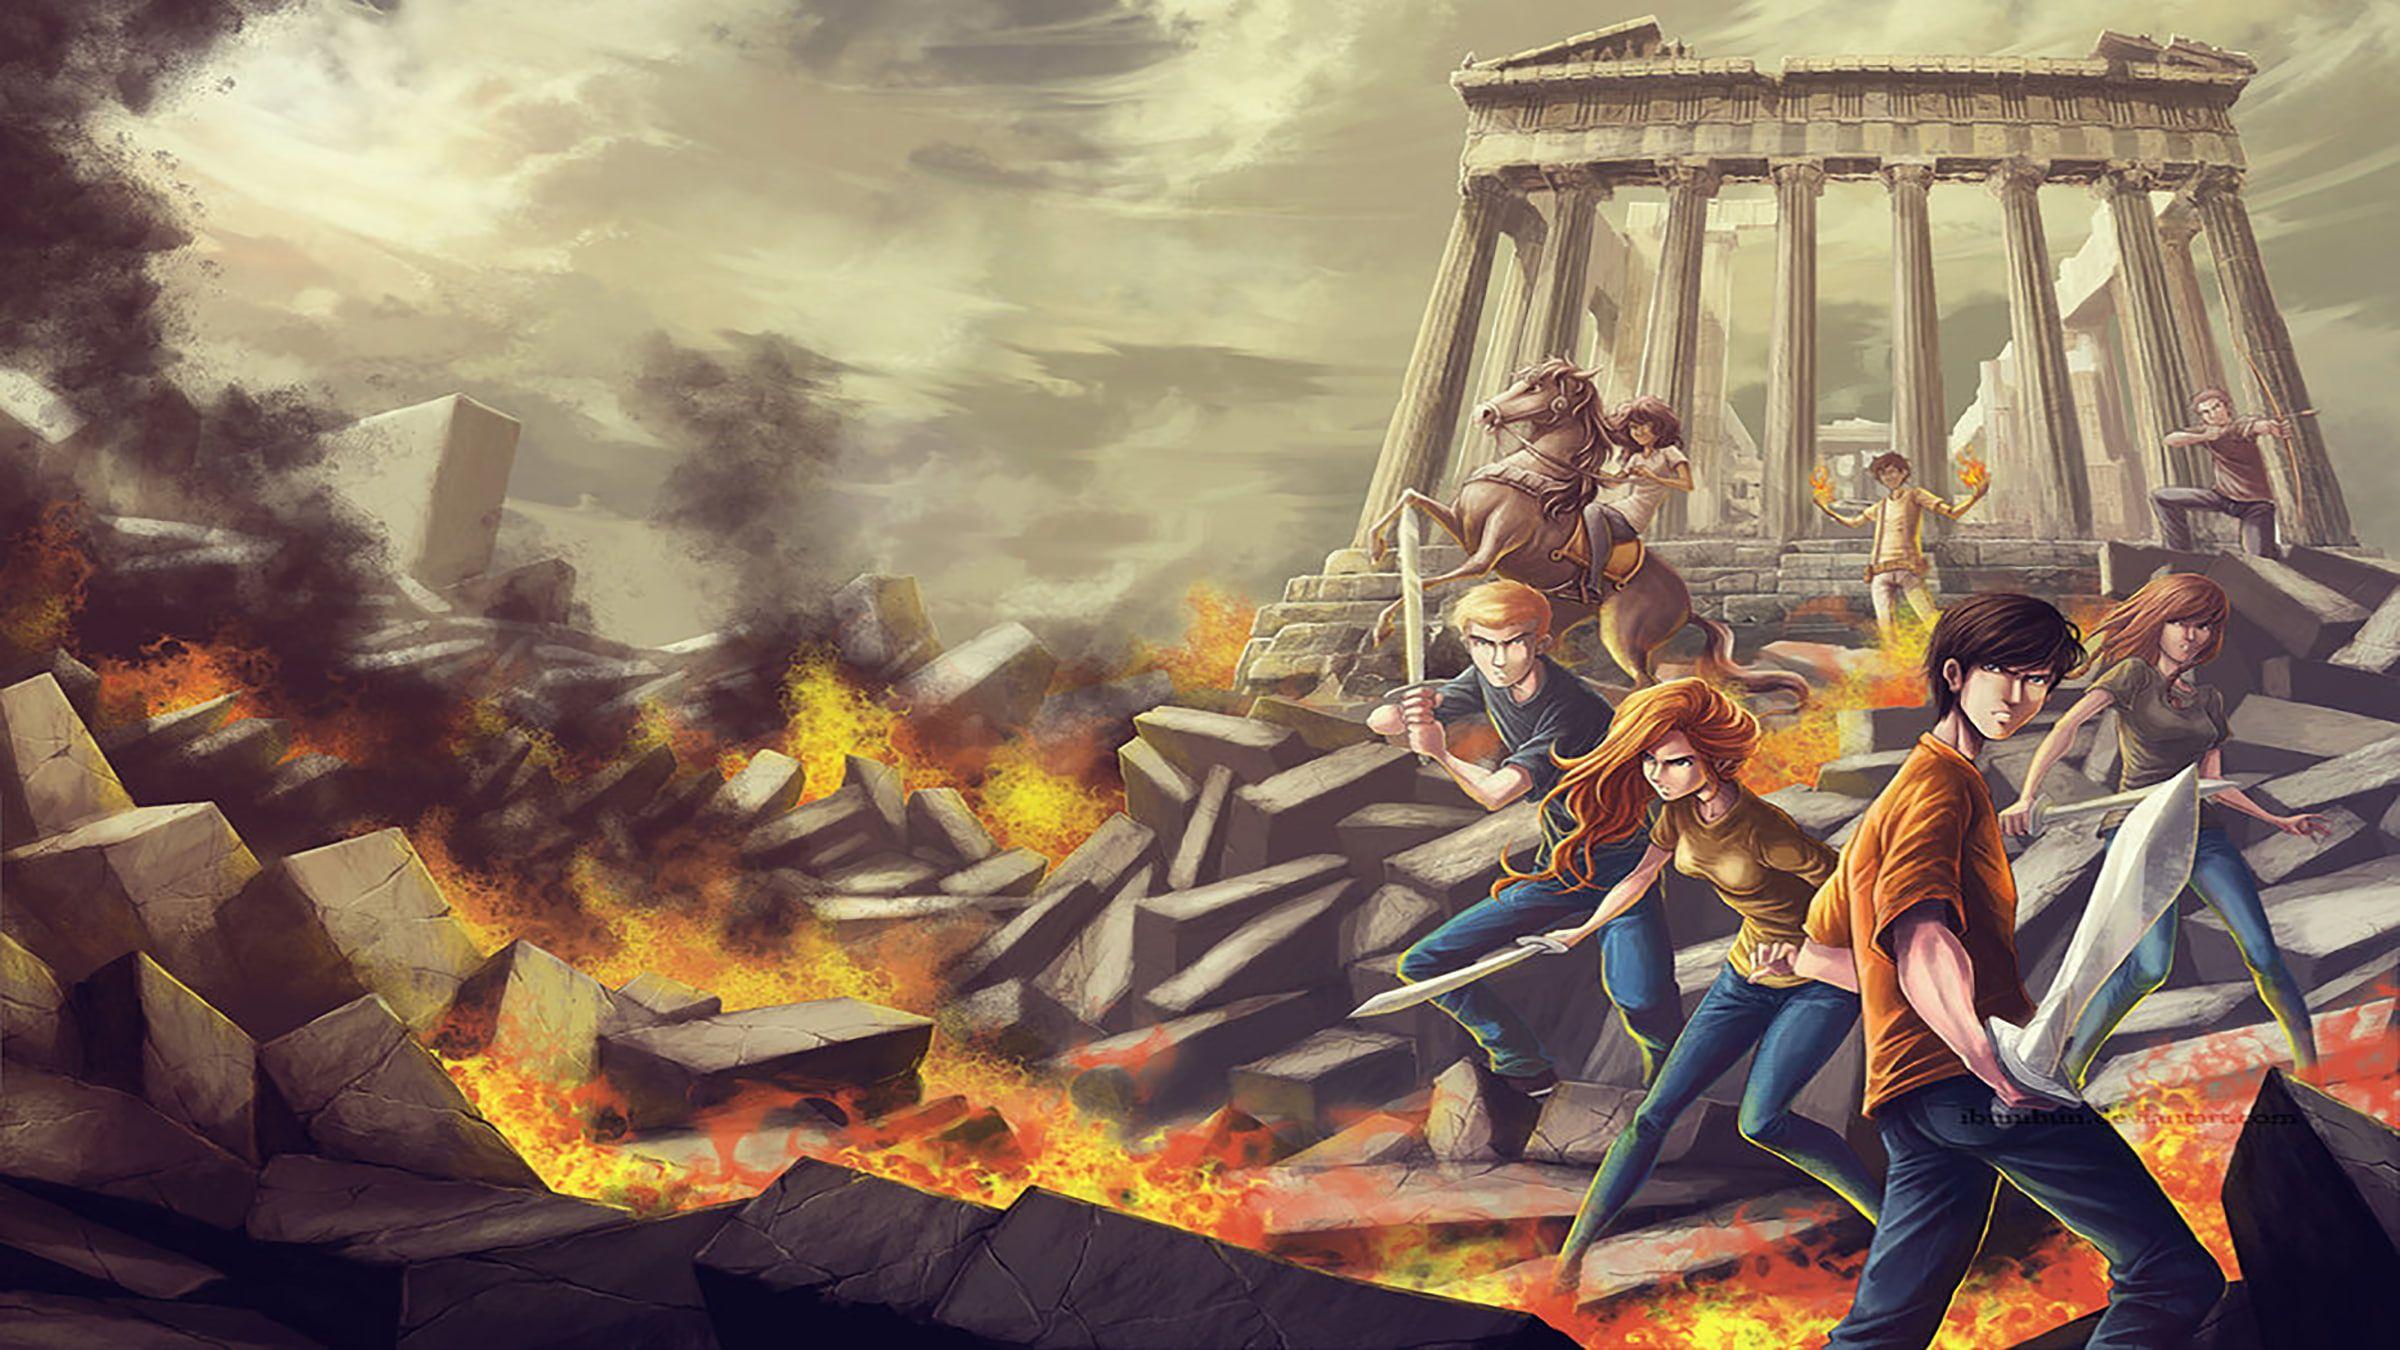 Percy Jackson Heroes Of Olympus Annabeth Chase 1080p Wallpaper Hdwallpaper Desktop Percy Jackson Wallpaper Heroes Of Olympus Percy Jackson